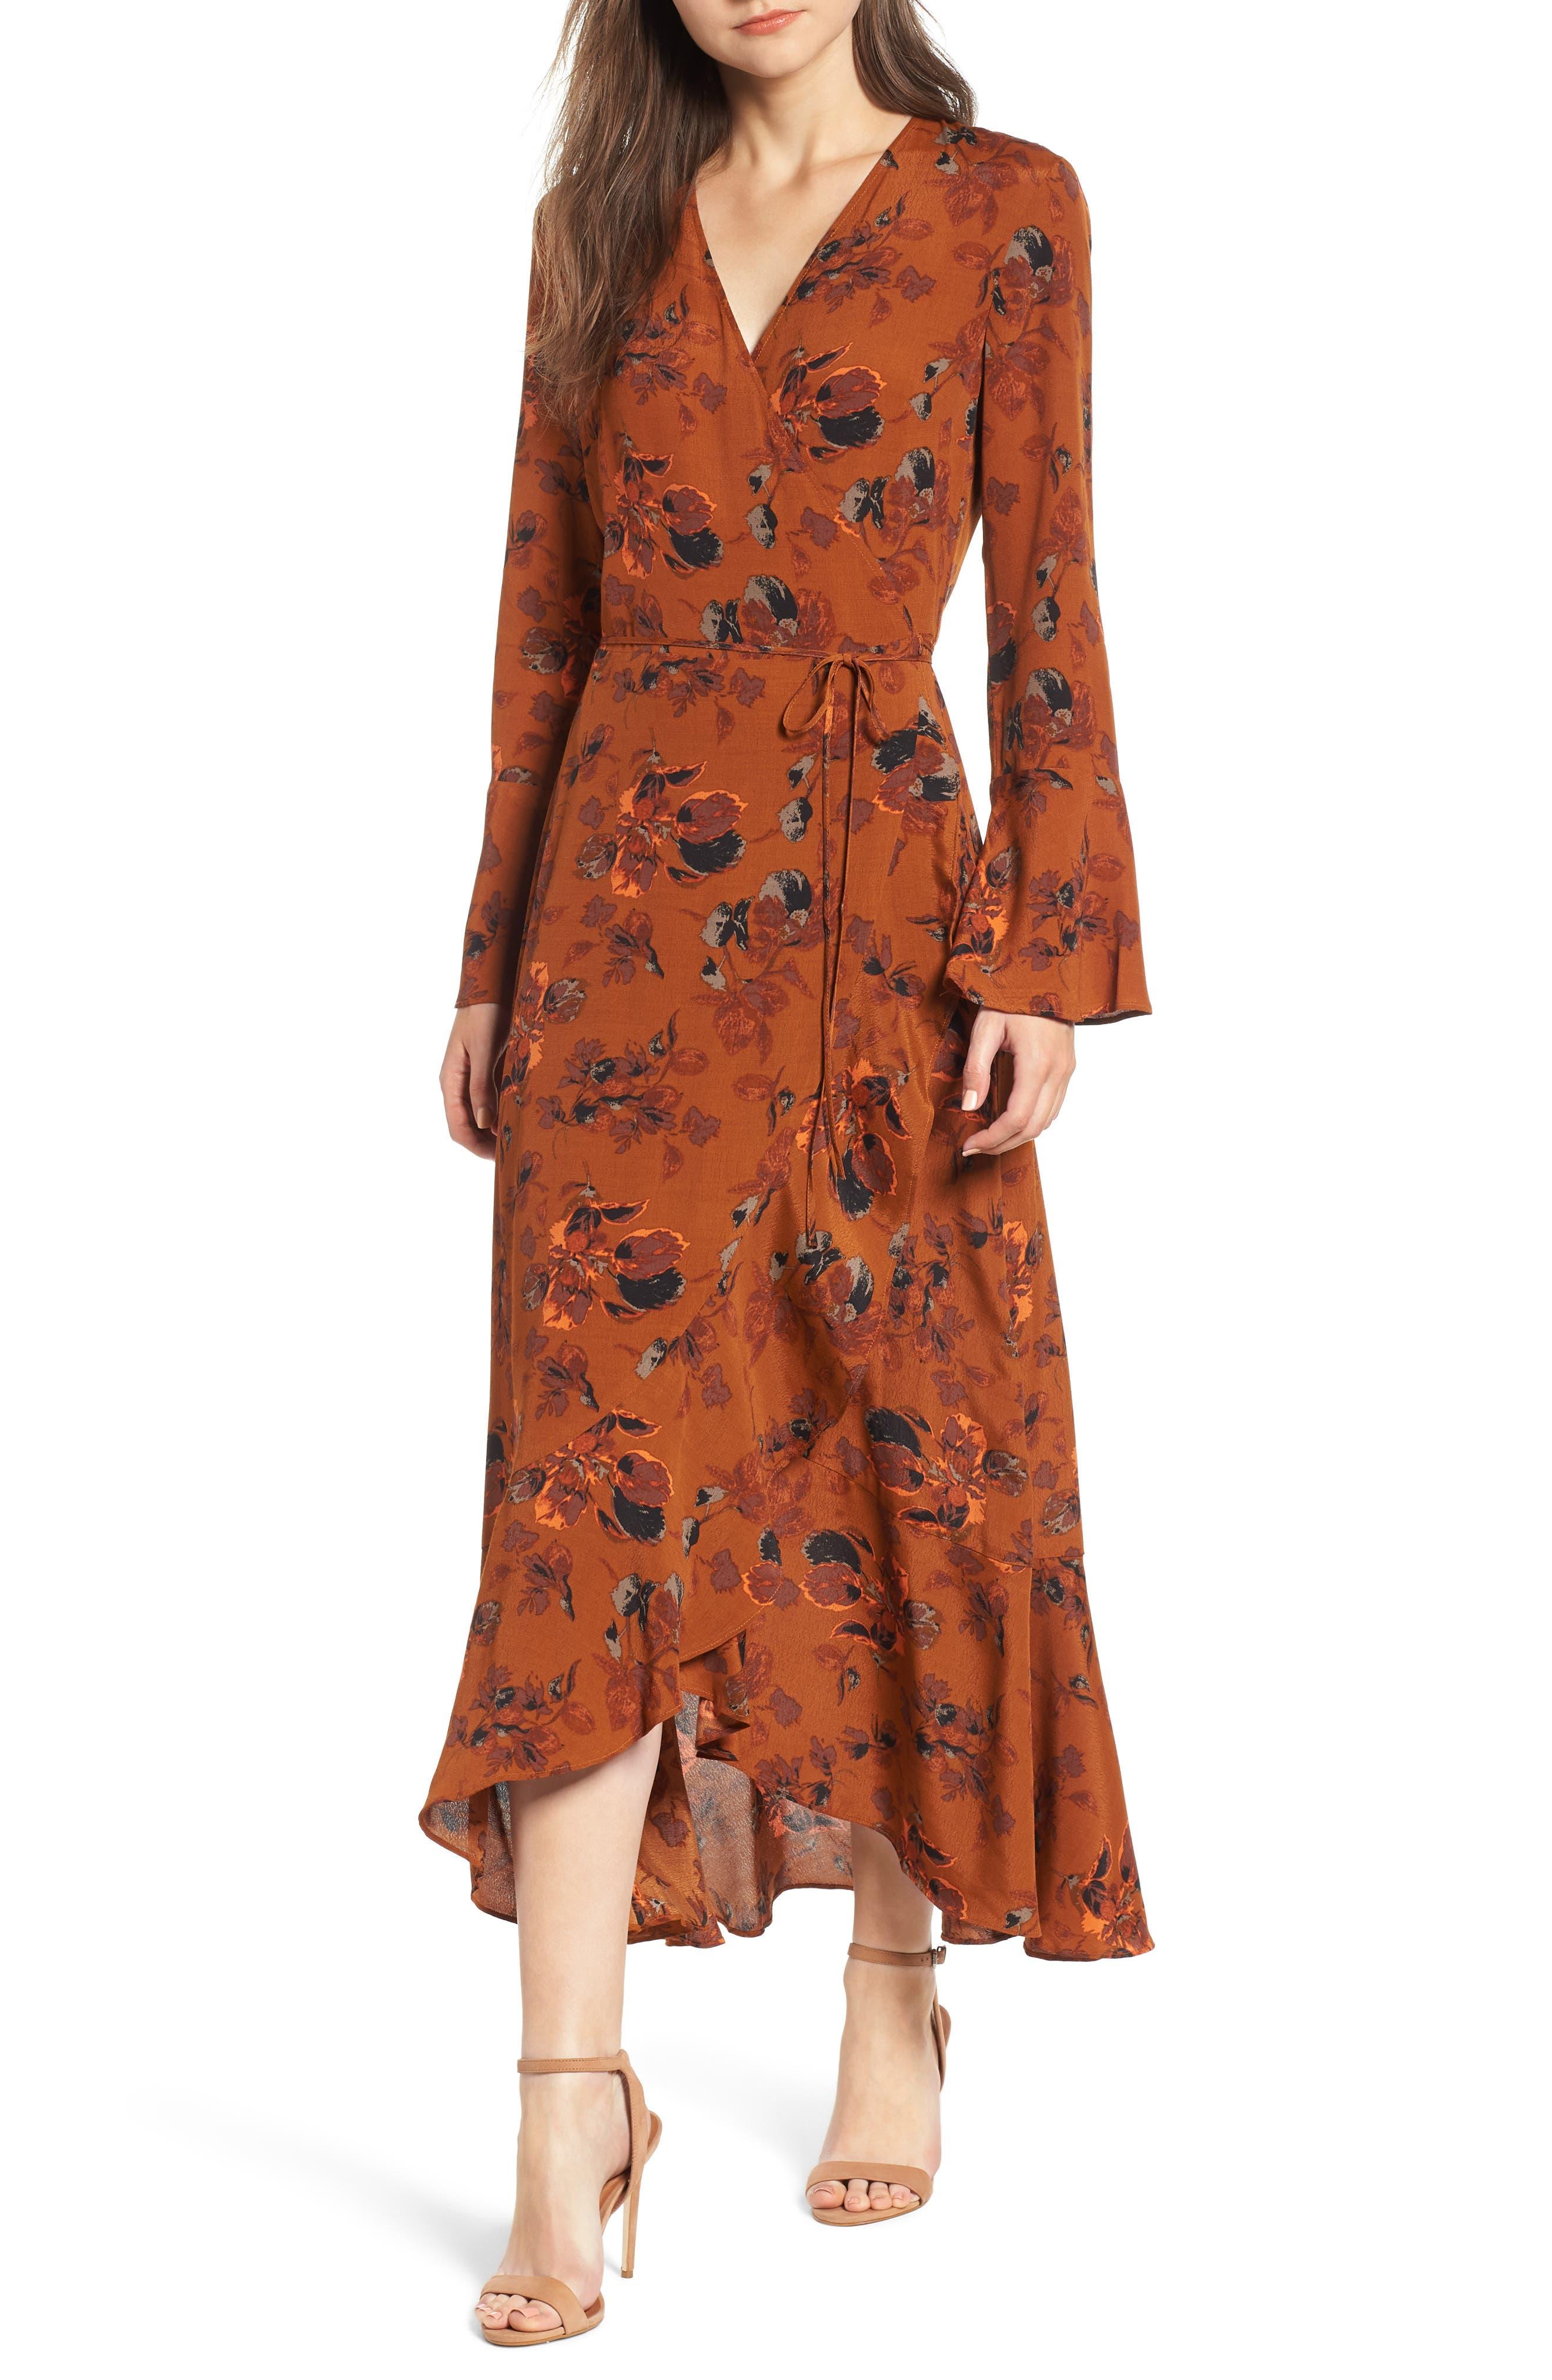 Bell Sleeve Wrap Midi Dress,                             Main thumbnail 1, color,                             RUST CARMEL FALL FOLIAGE